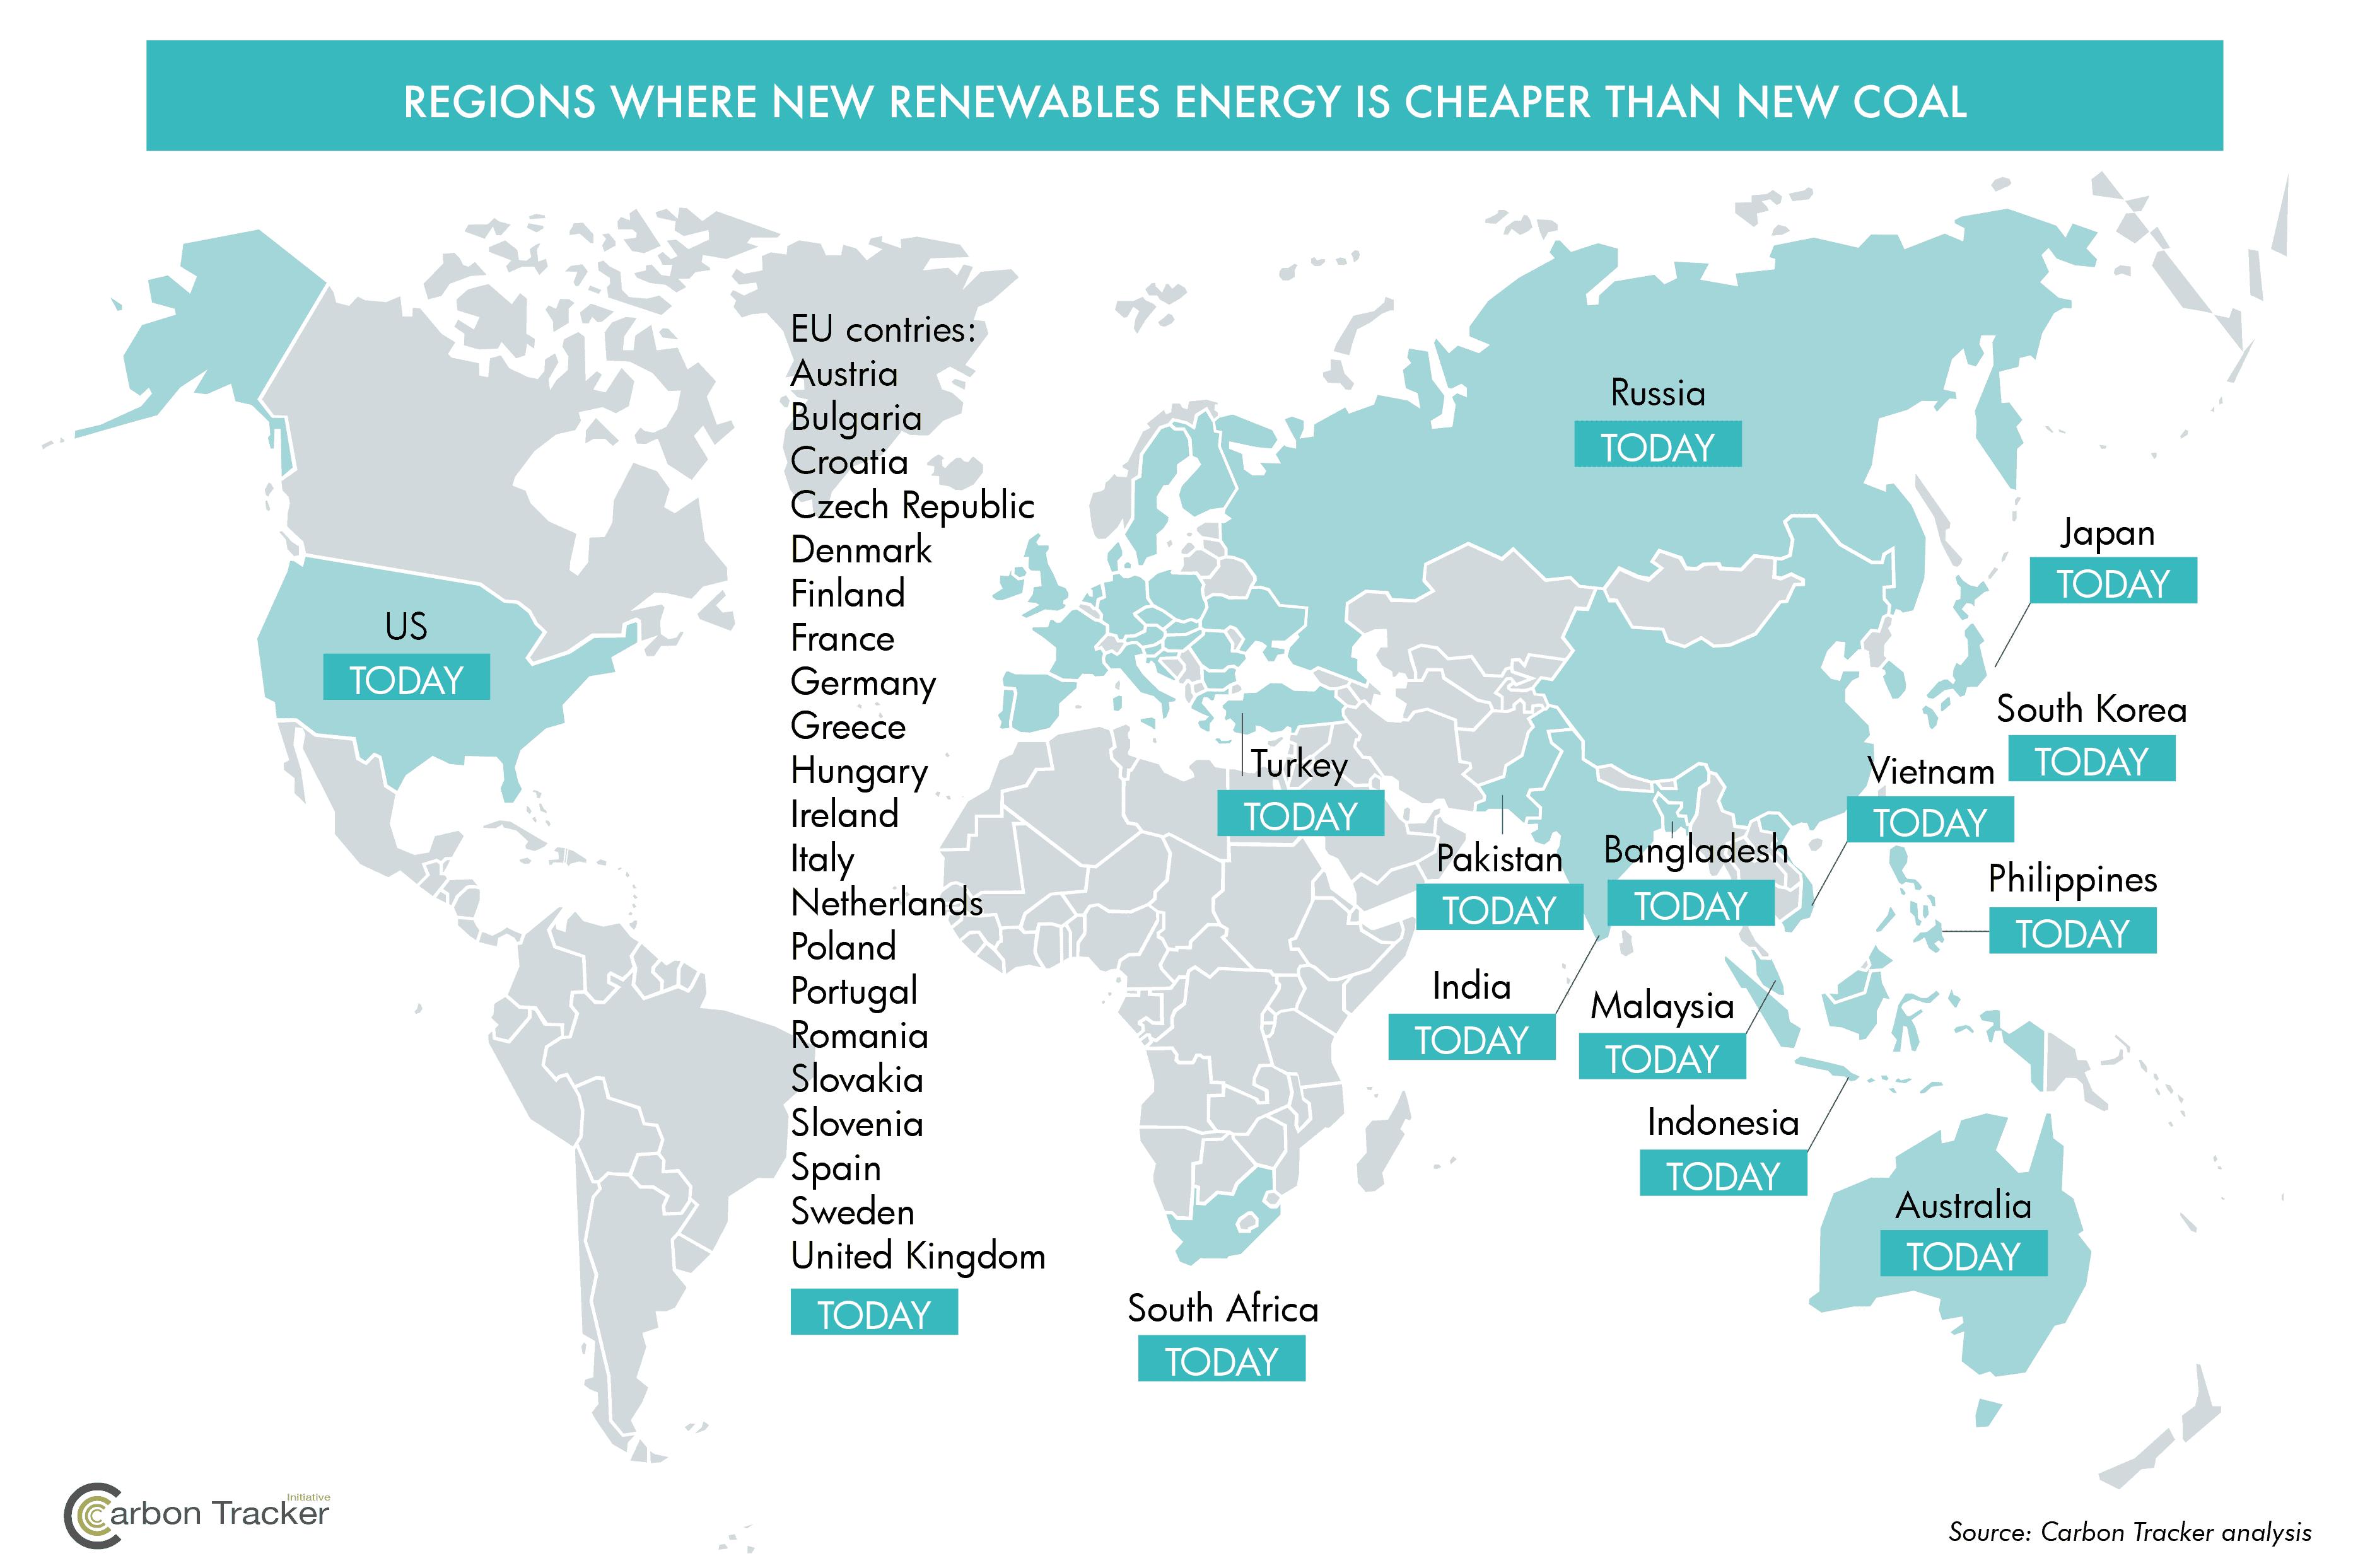 Carbon Tracker Renewable Energy Report